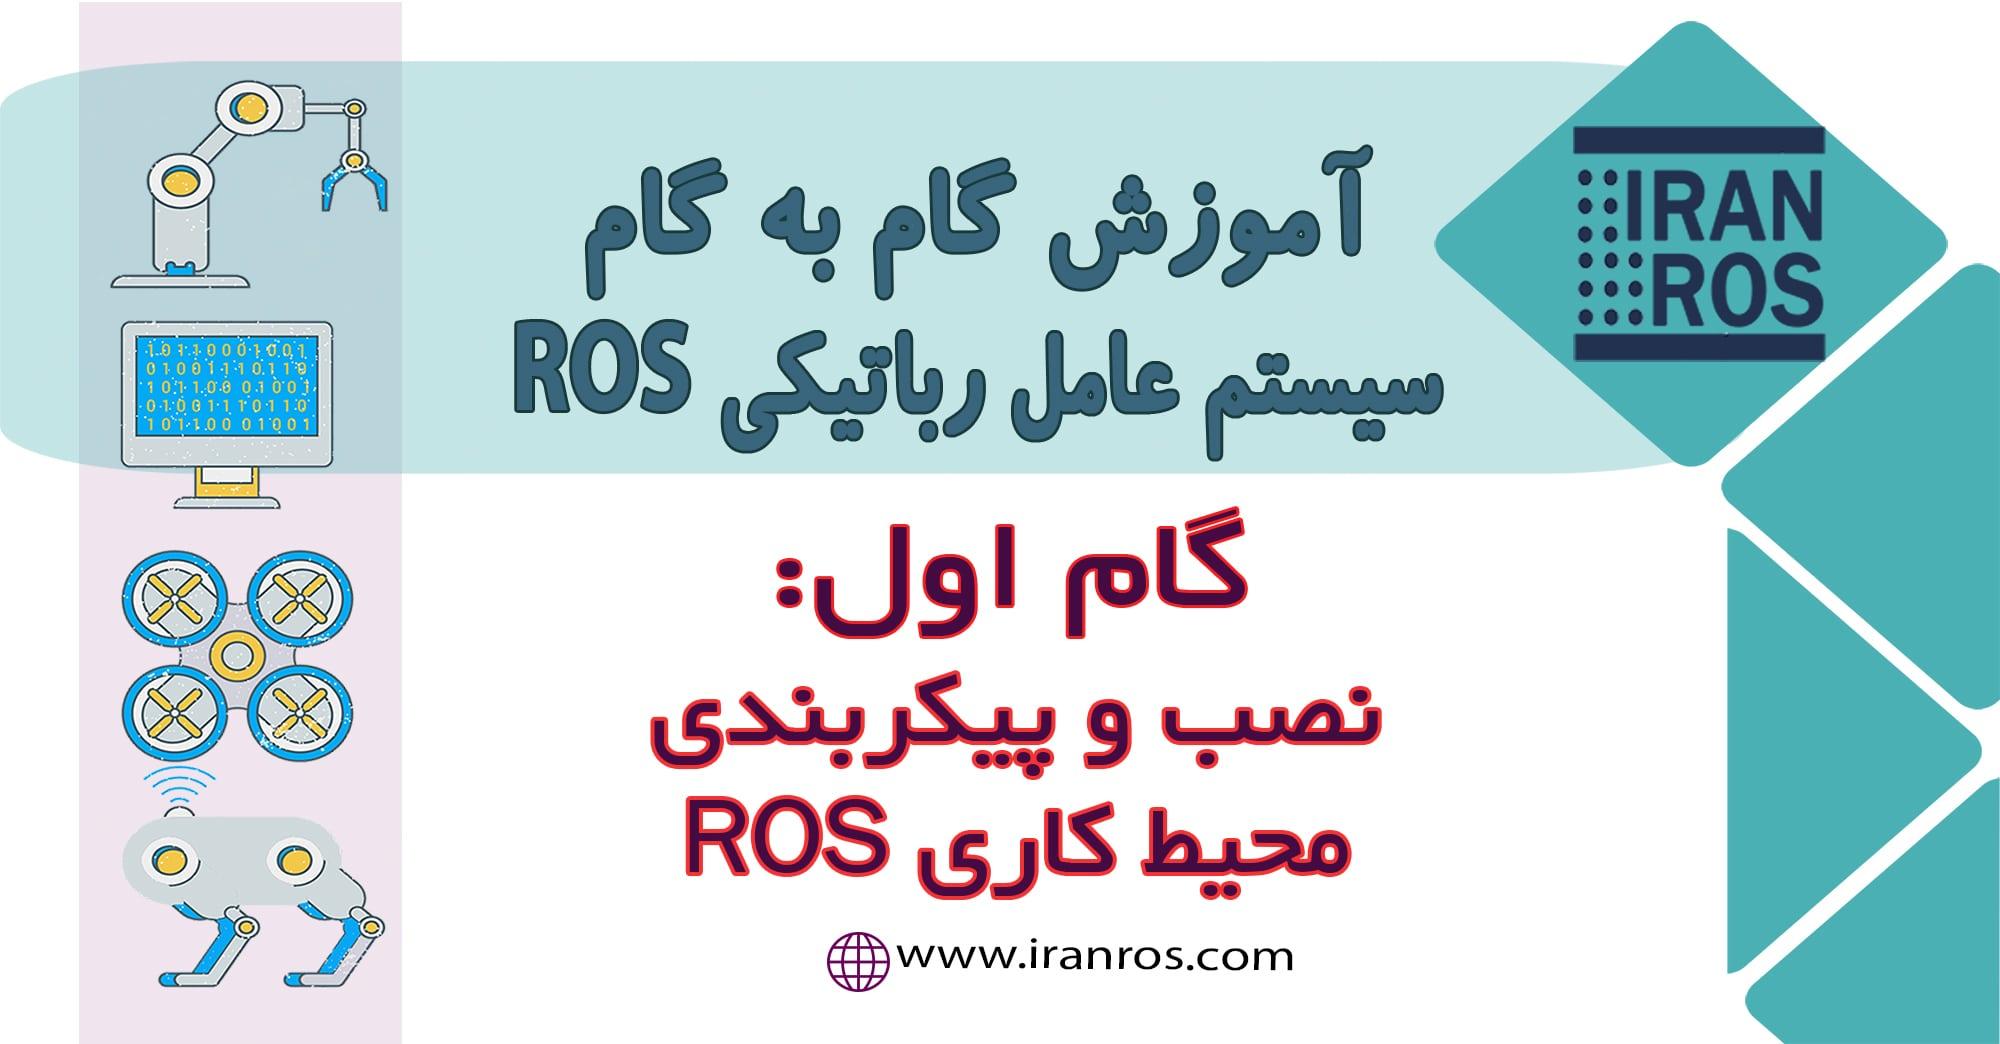 نصب و پیکربندی محیط ROS